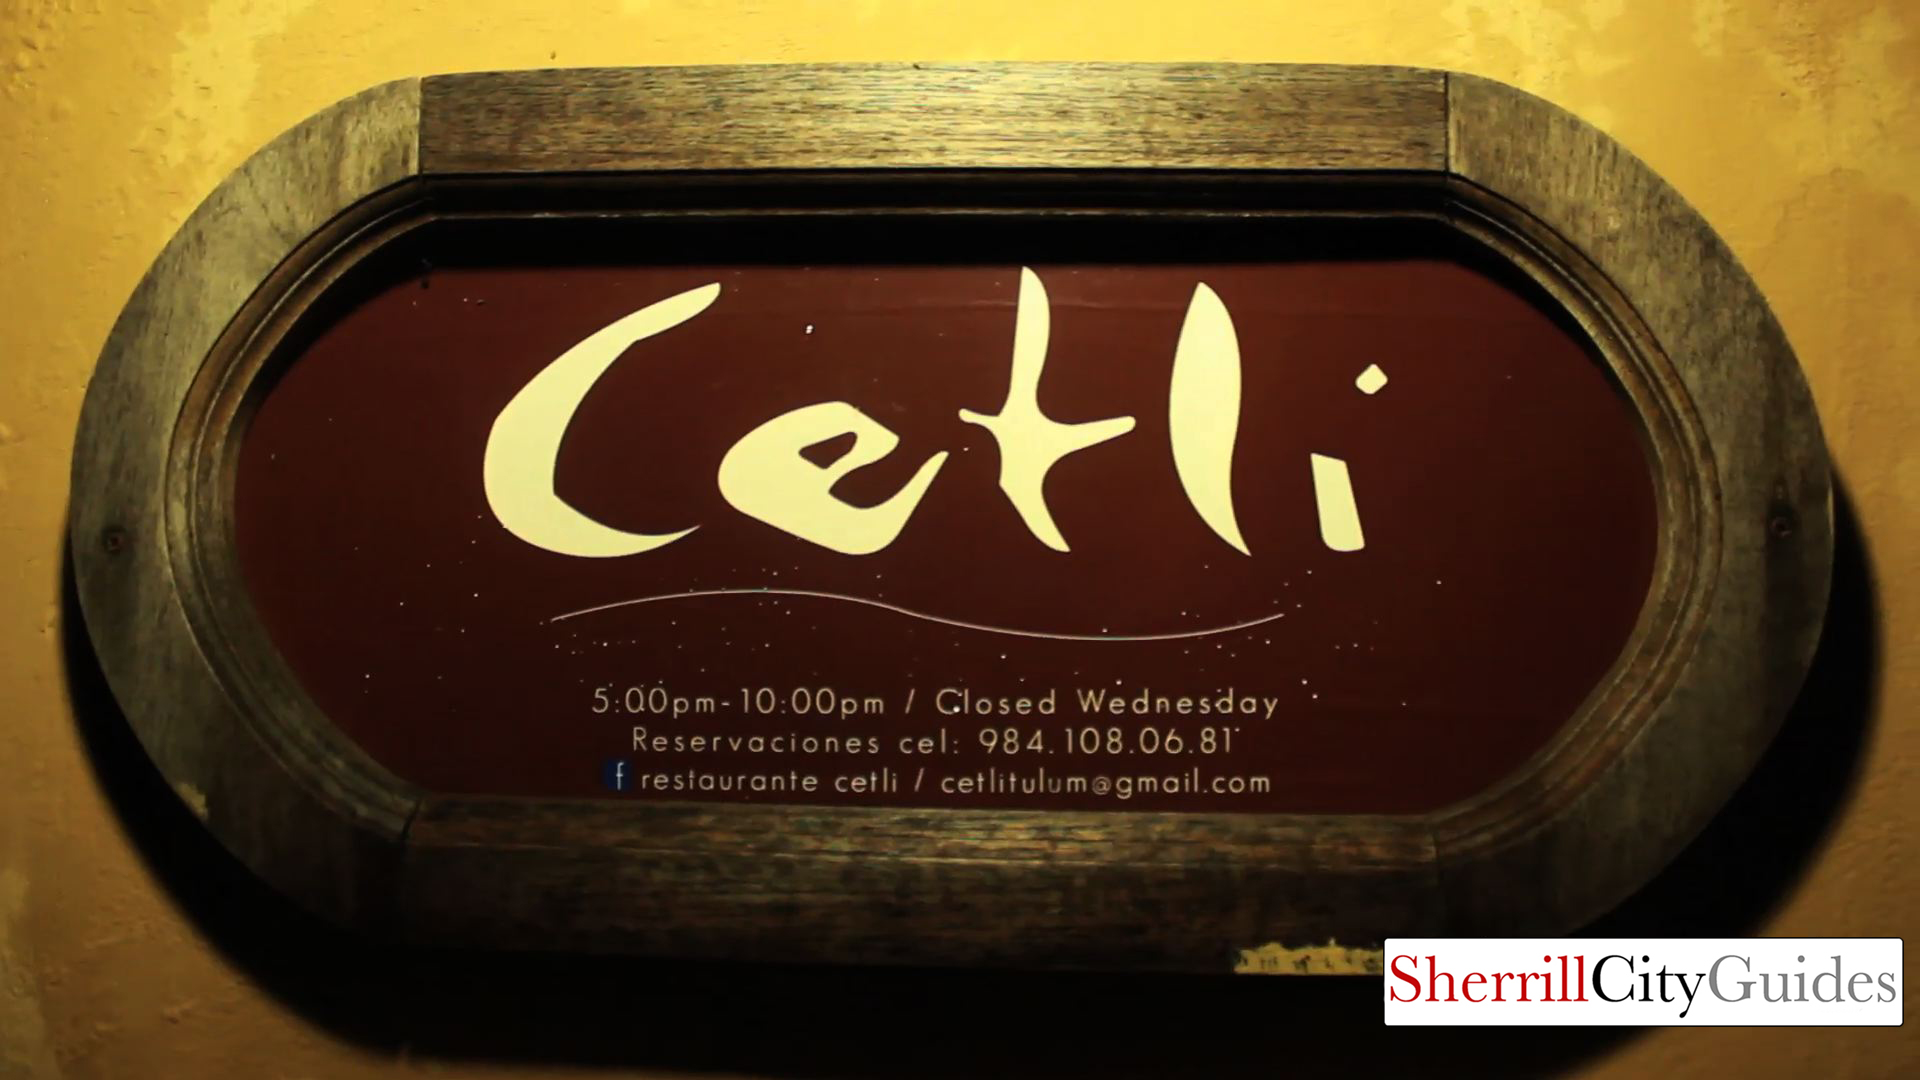 Cetli Restaurante